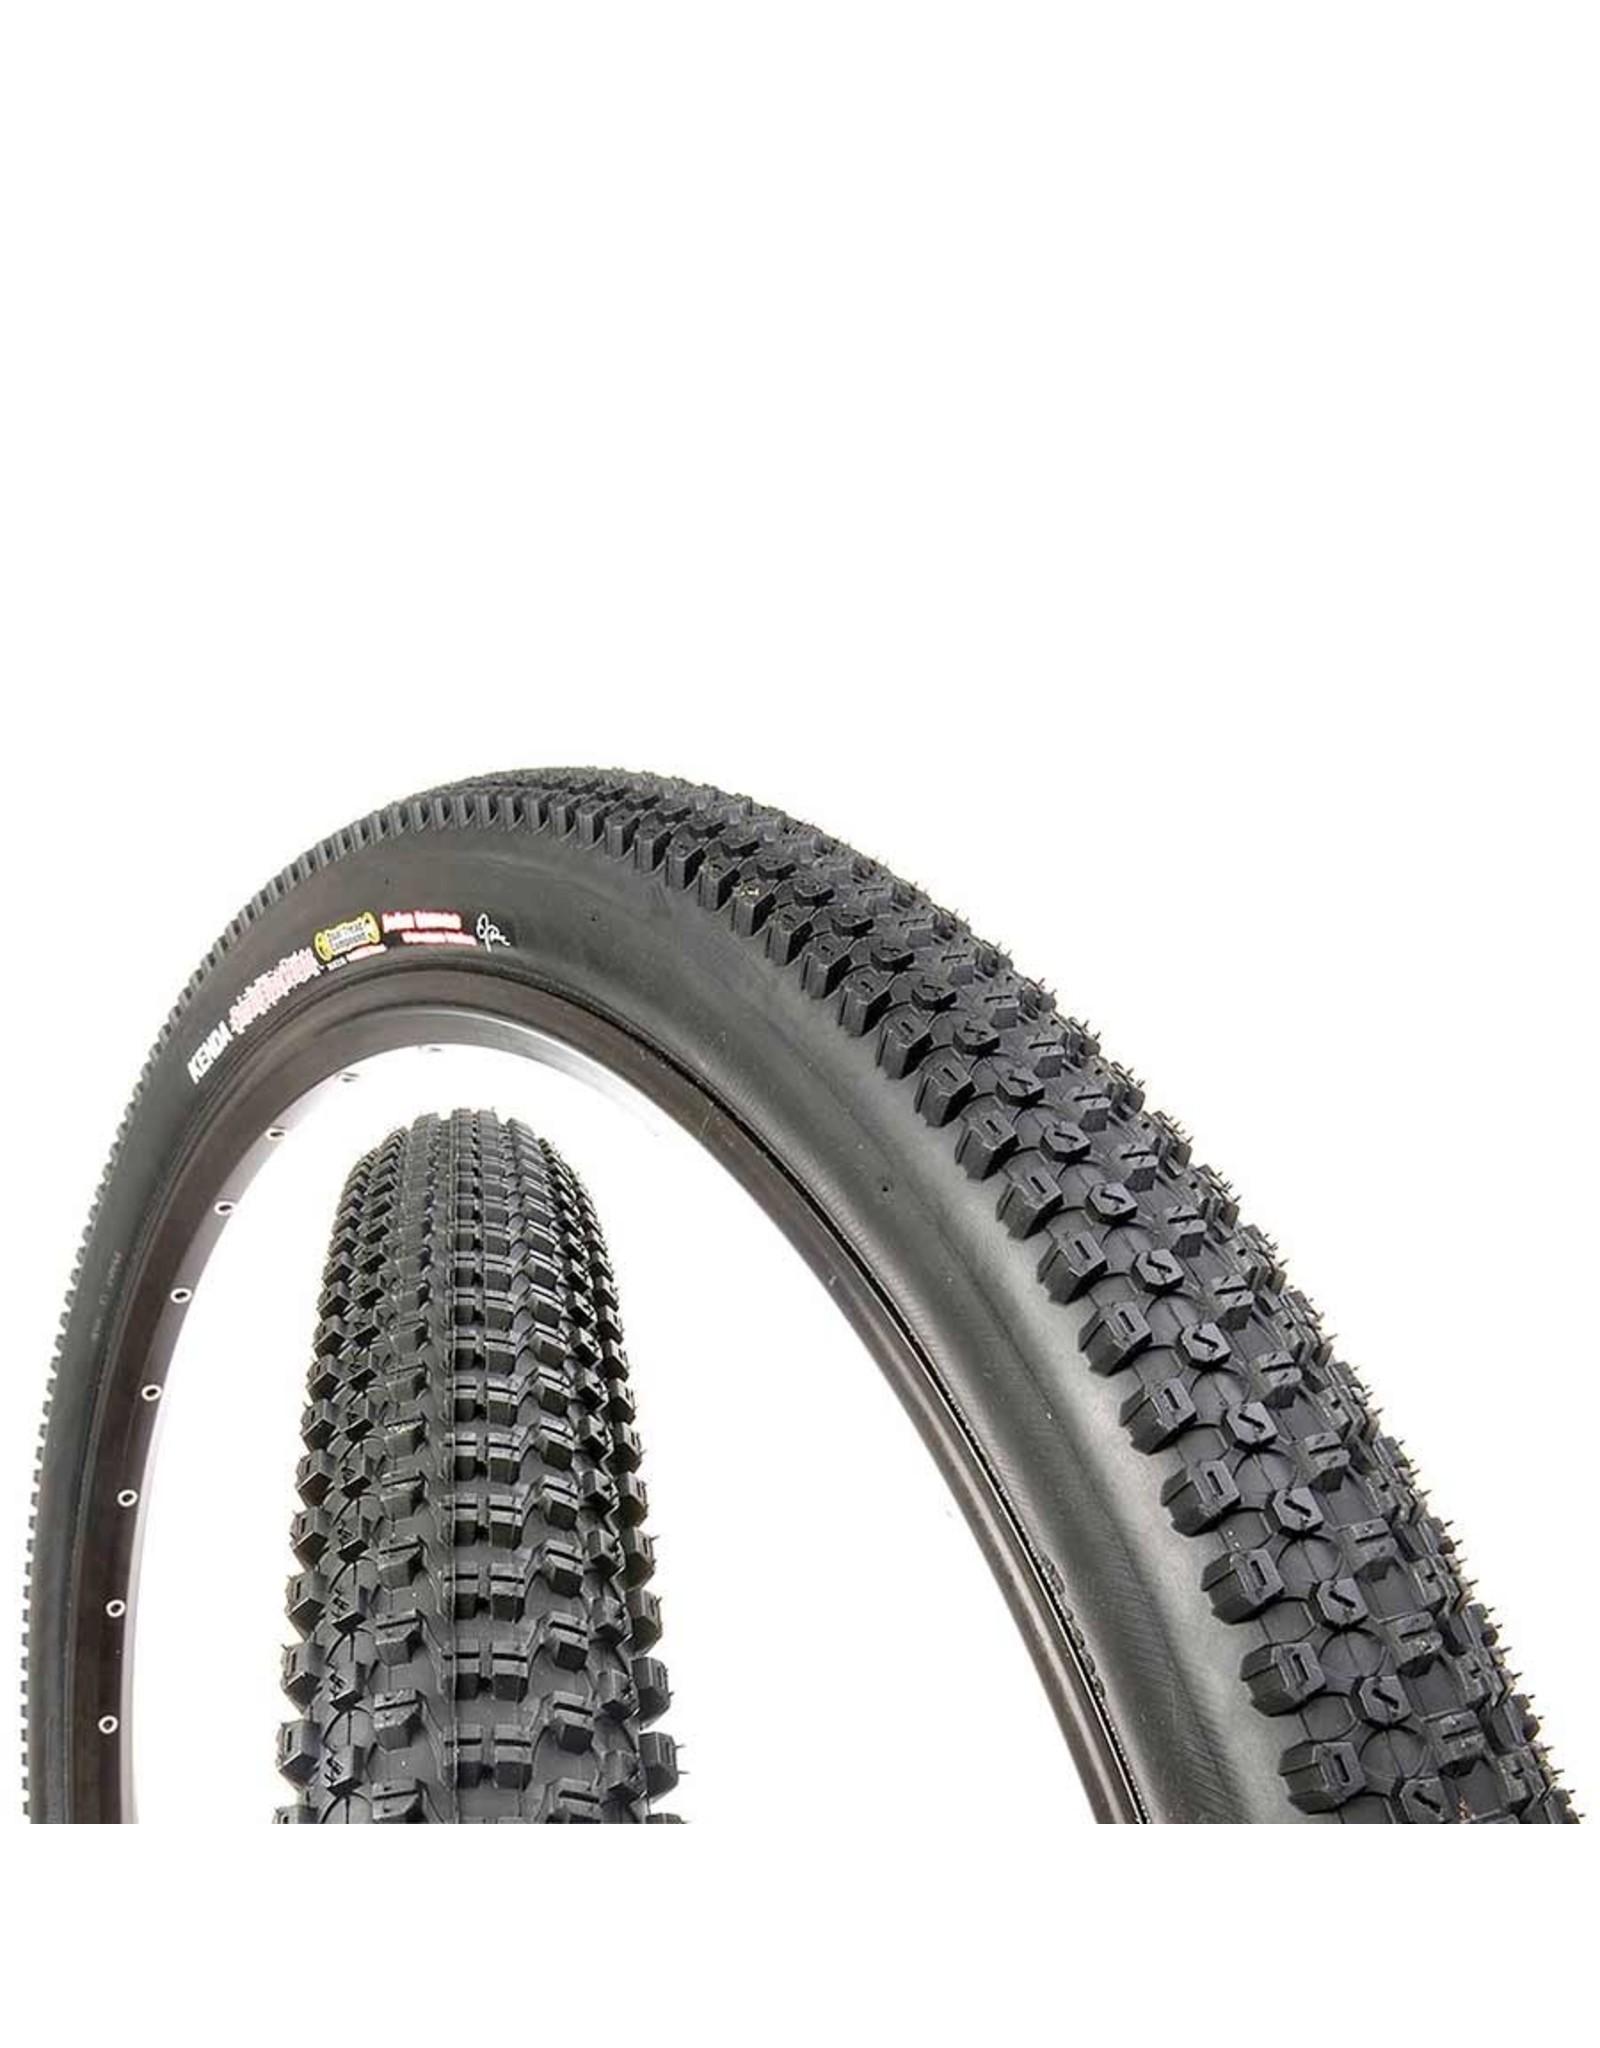 Kenda, Small Block 8, Tire, 700x35C, Folding, Clincher, DTC, 120TPI, Black